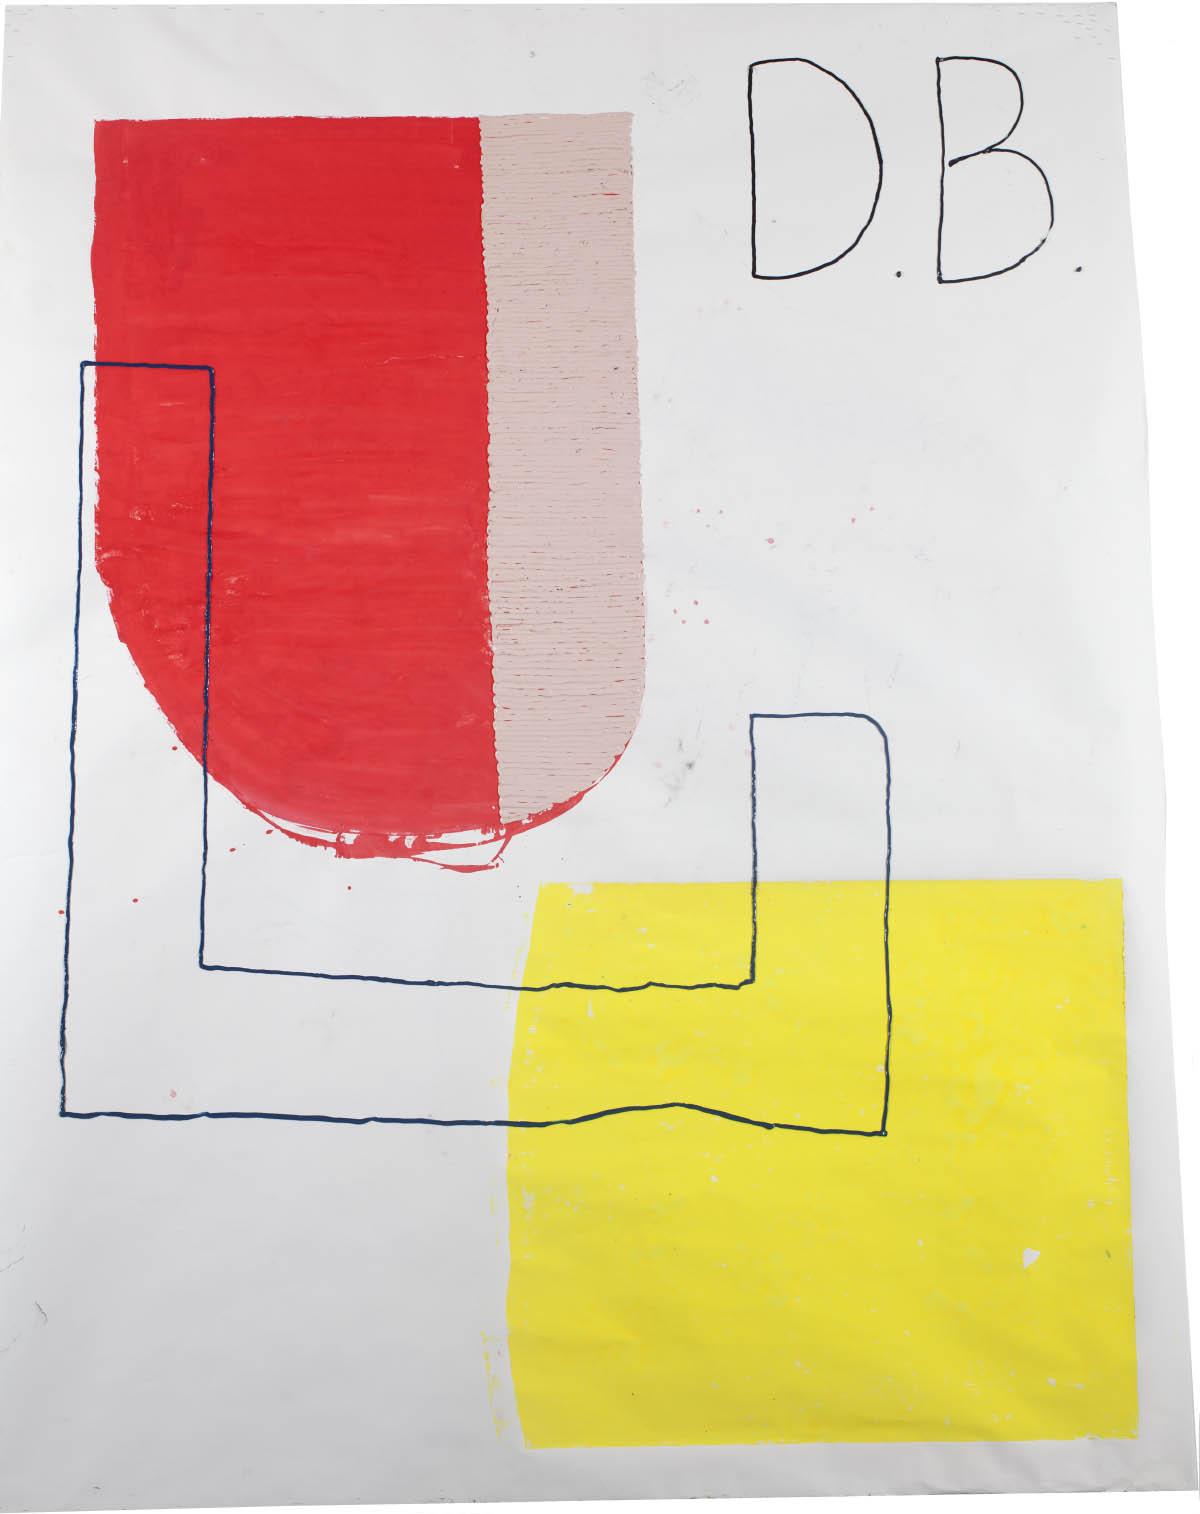 howloveworks, 2015, silicon, linoleum print on paper, 380cm x 320cm, © Bodo Schlack